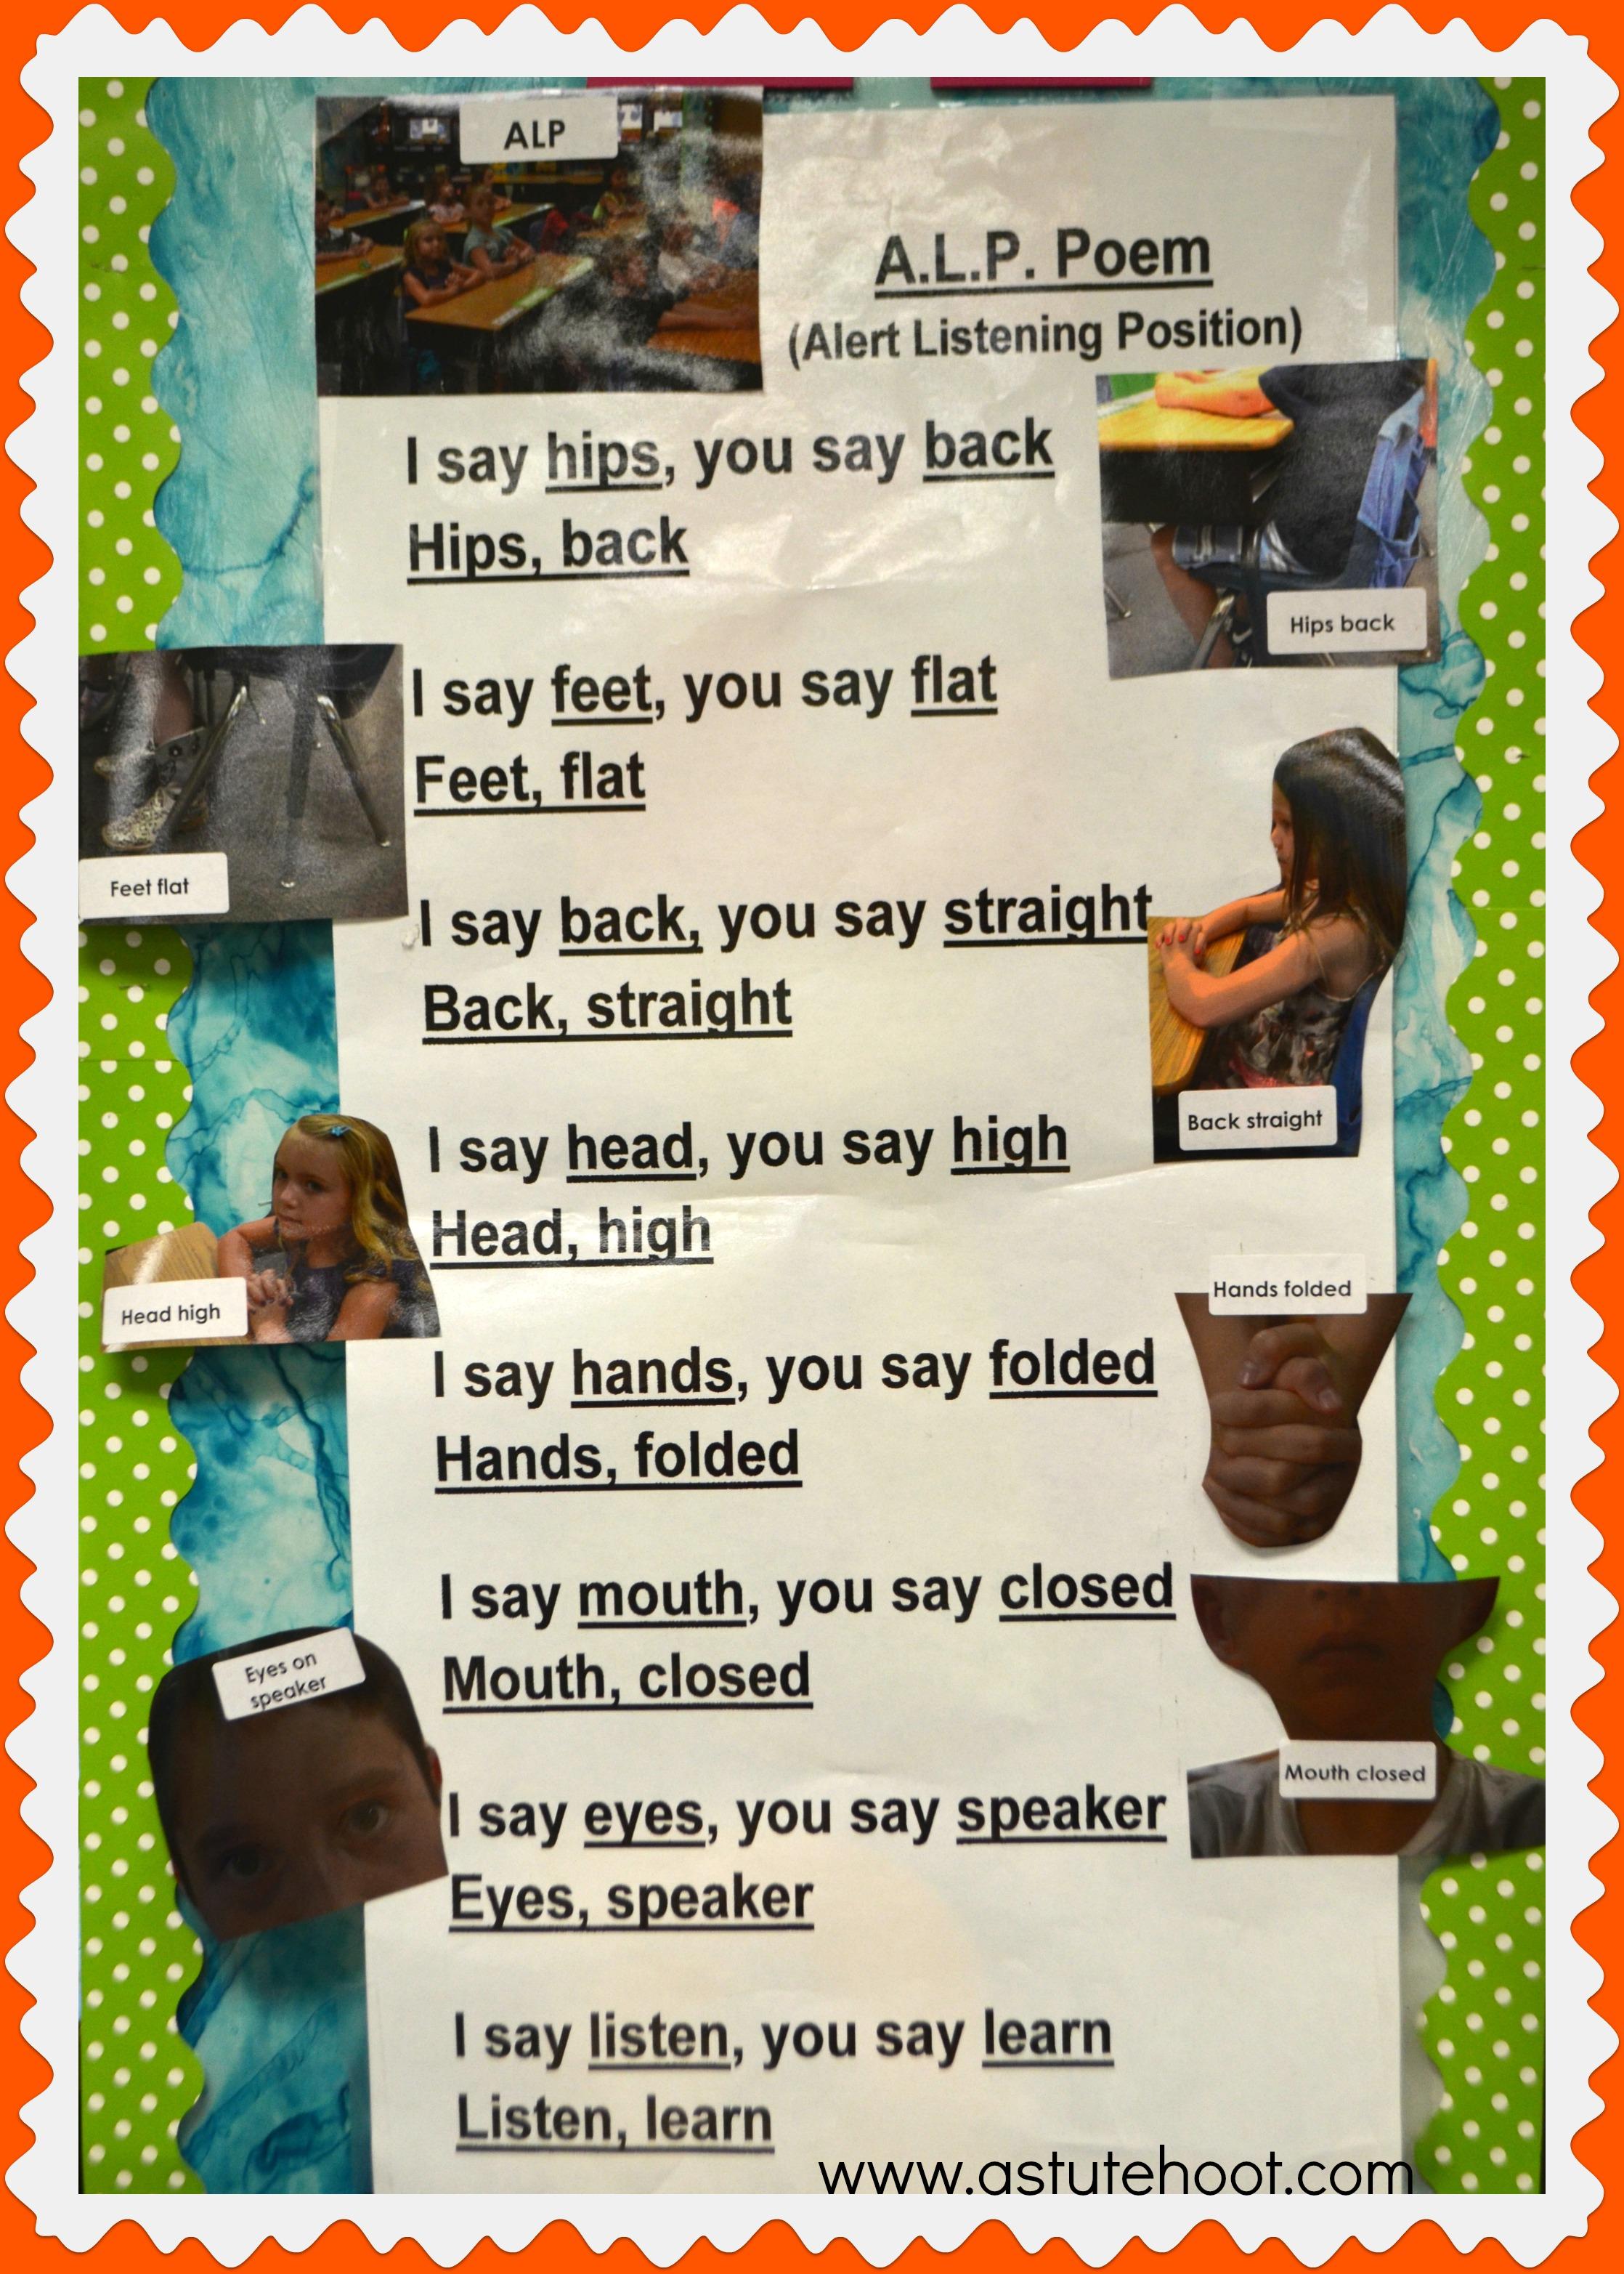 ALP poem class